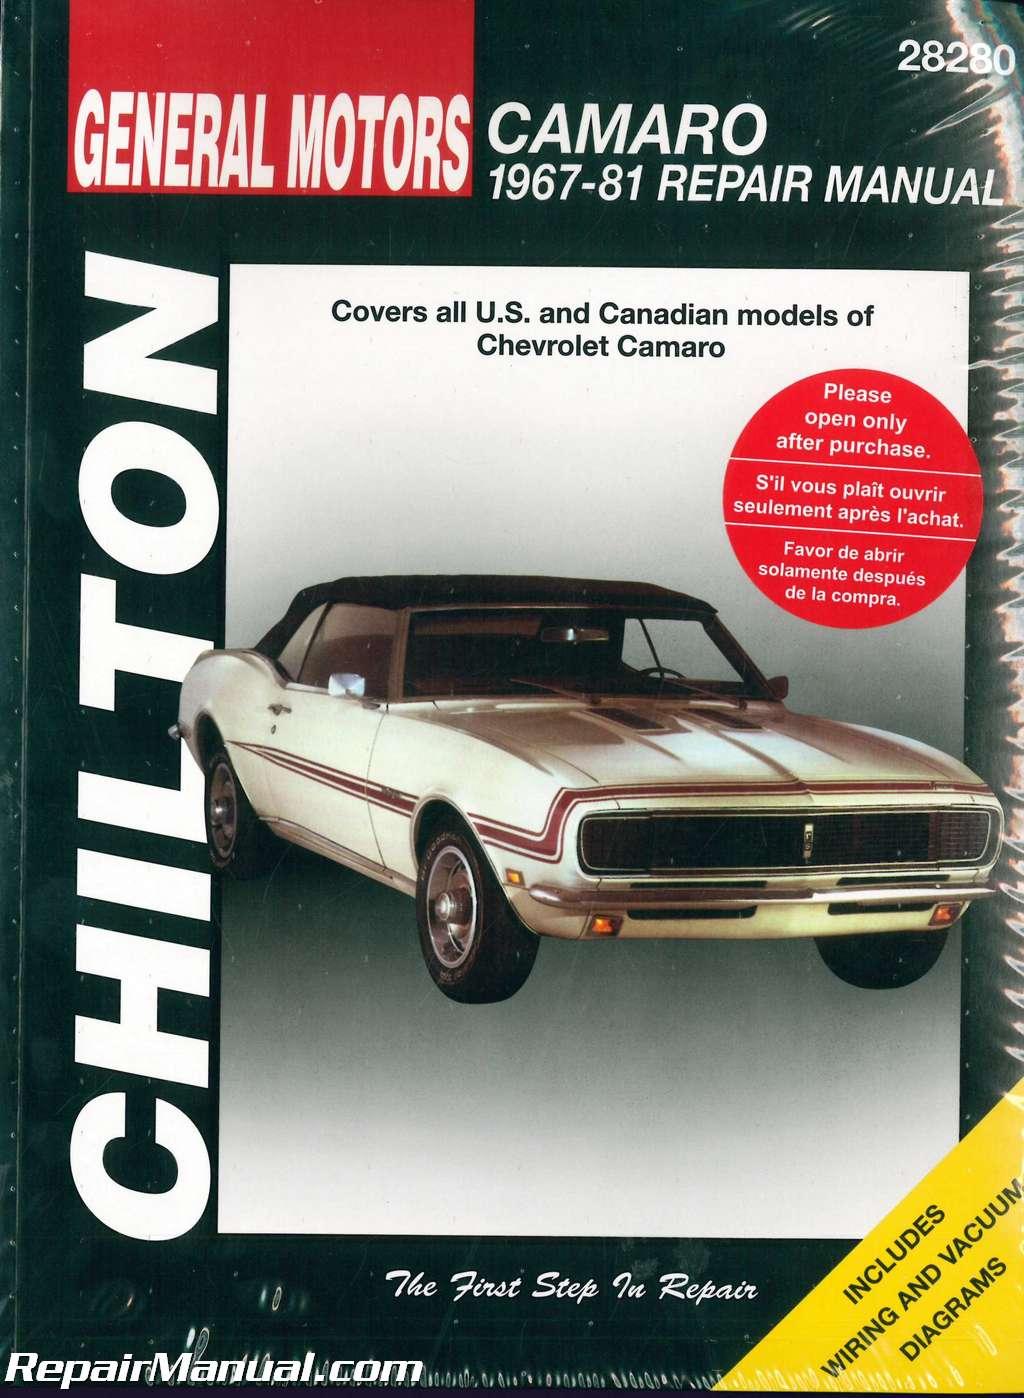 1967 1981 chevrolet camaro repair manual by chilton rh repairmanual com 2014 Chevrolet Camaro SS 2016 Chevy Camaro